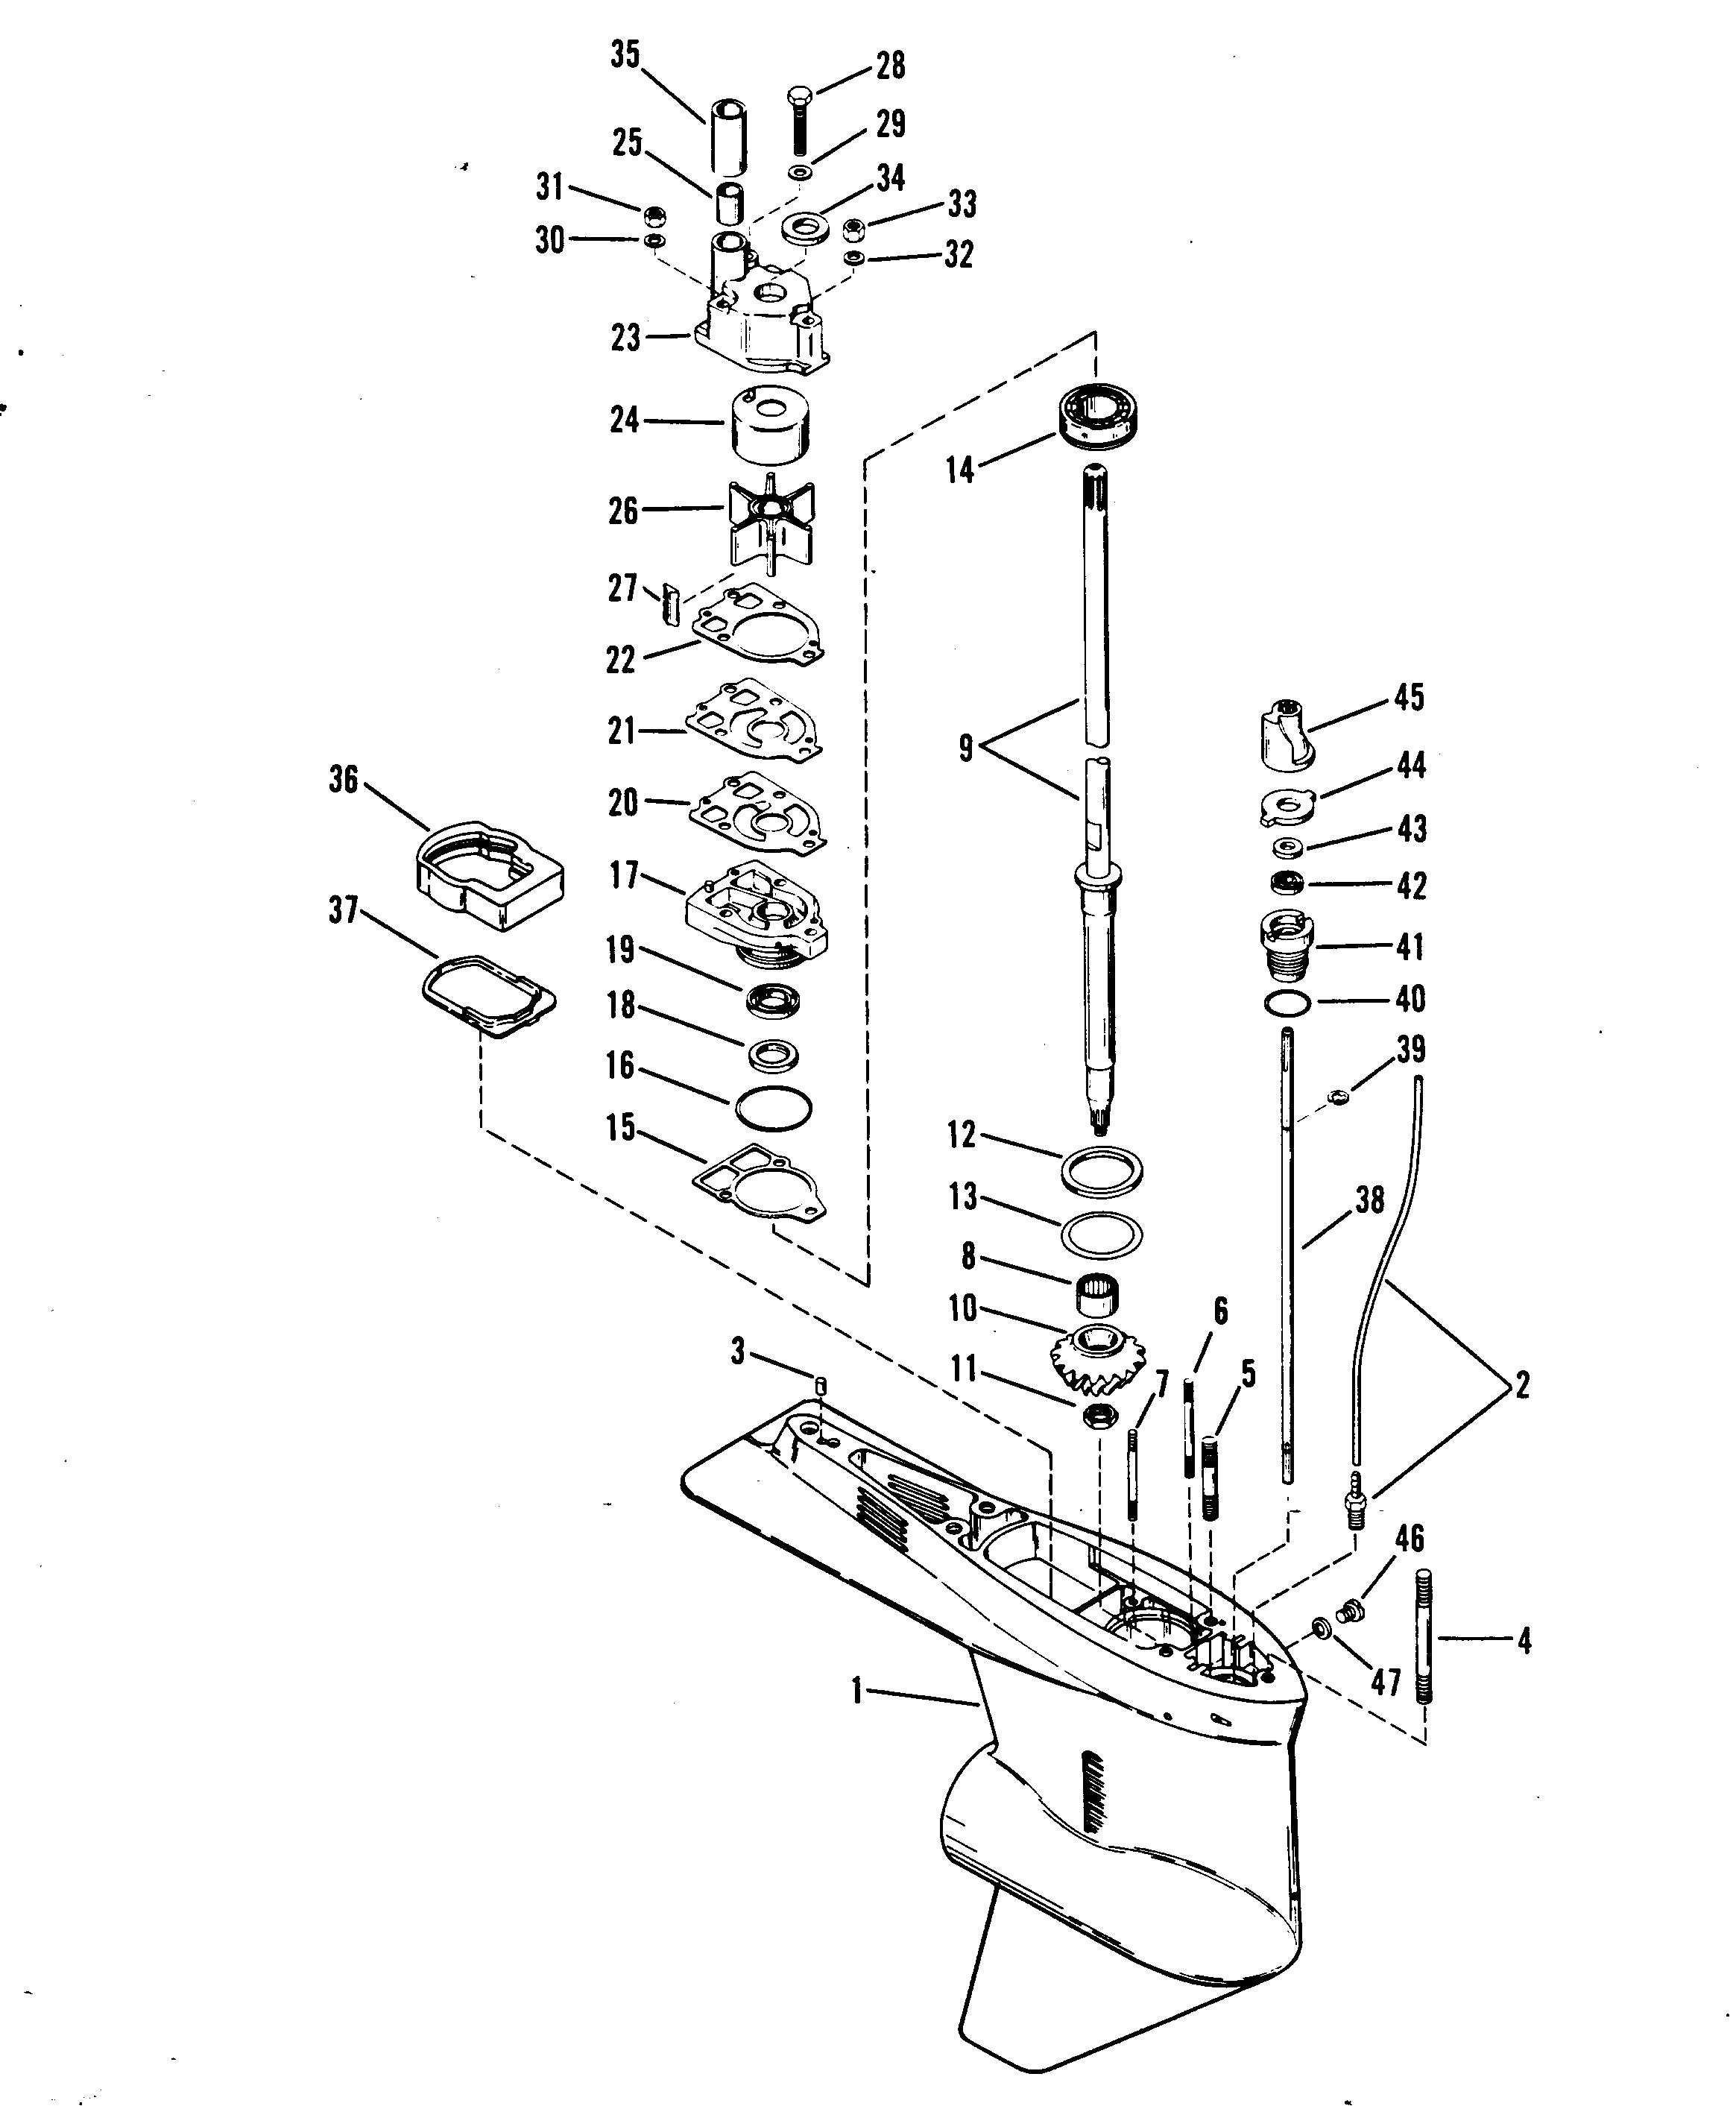 Gear Housing Drive Shaft For Mariner Mercury 75 H P